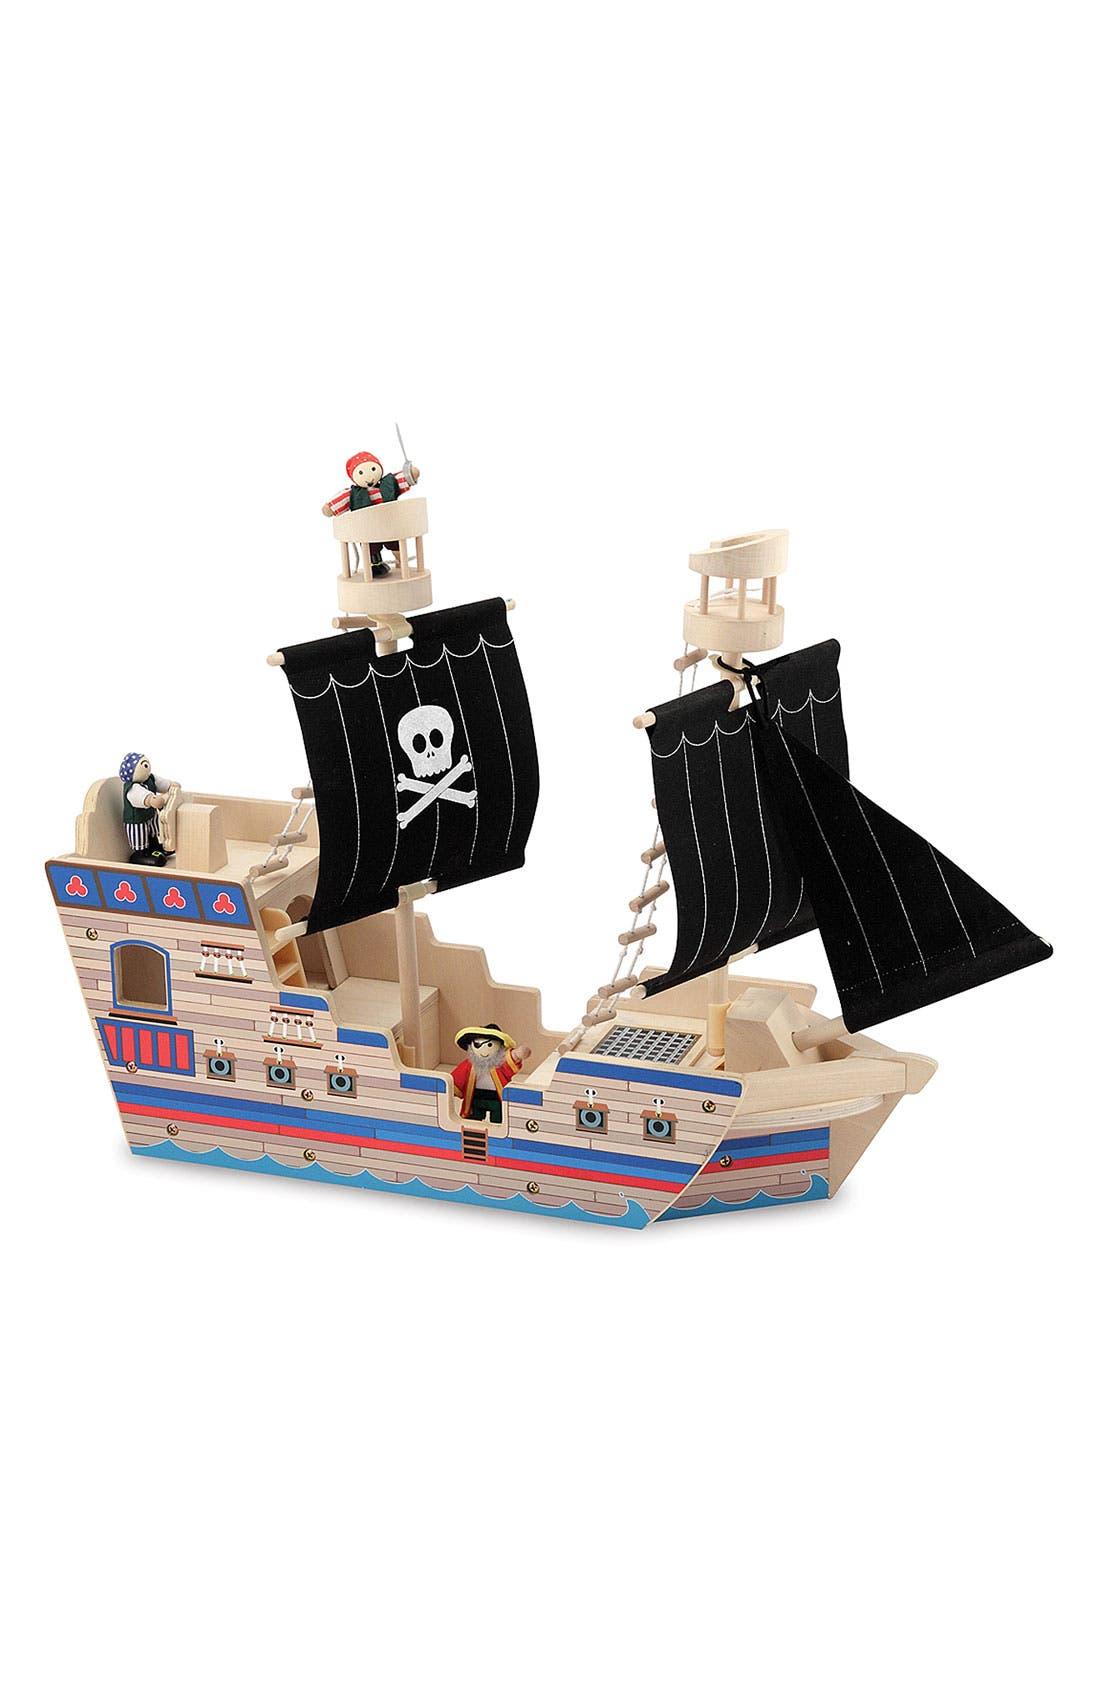 MELISSA & DOUG Pirate Ship Play Set, Main, color, 960